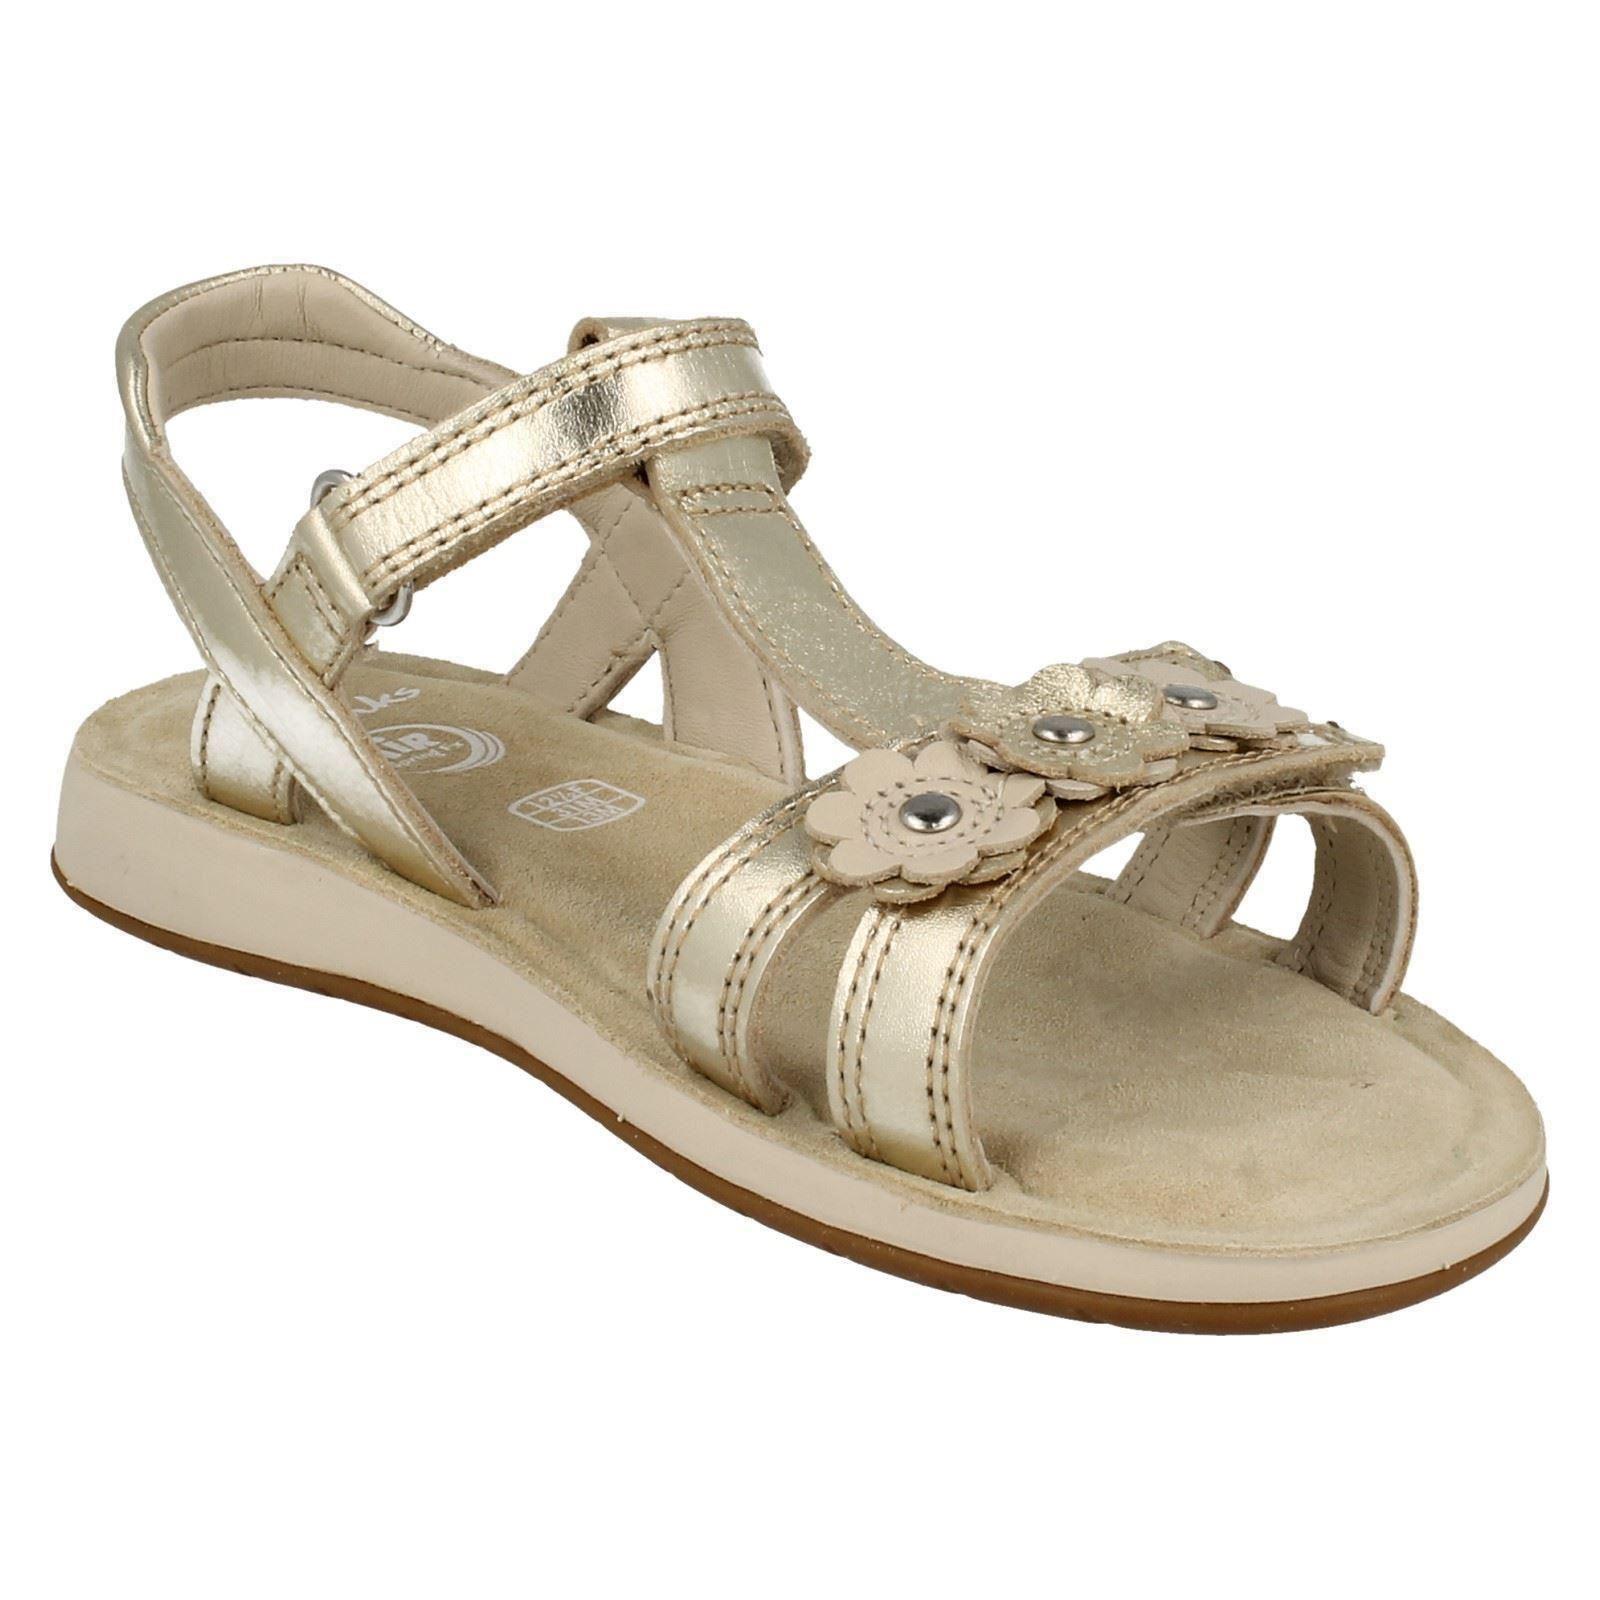 0b568731481 Girls Clarks Sandals With Flower Detail Sea Sally Gold UK 11.5 Kids ...